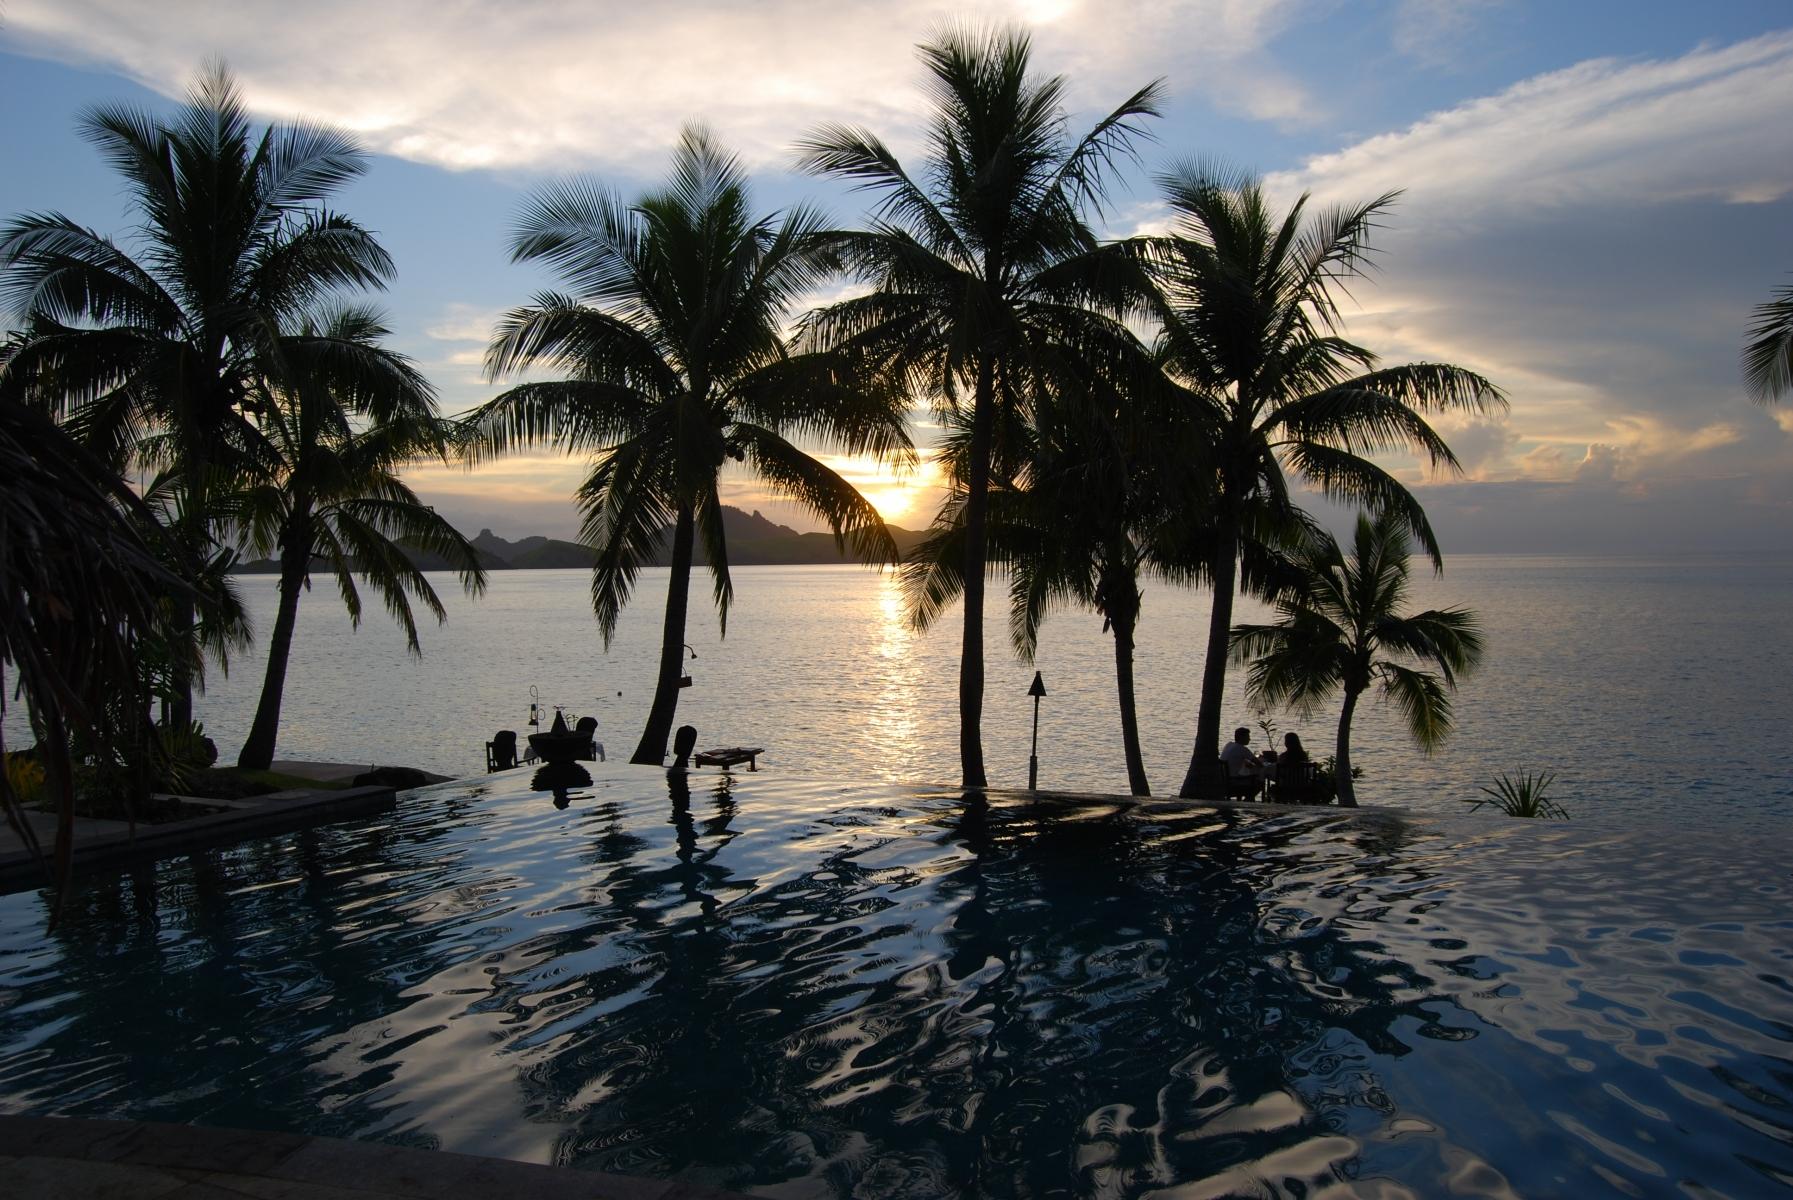 Tokoriki-Island-Resort-Fiji-2-1-2011-8-21-00-PM